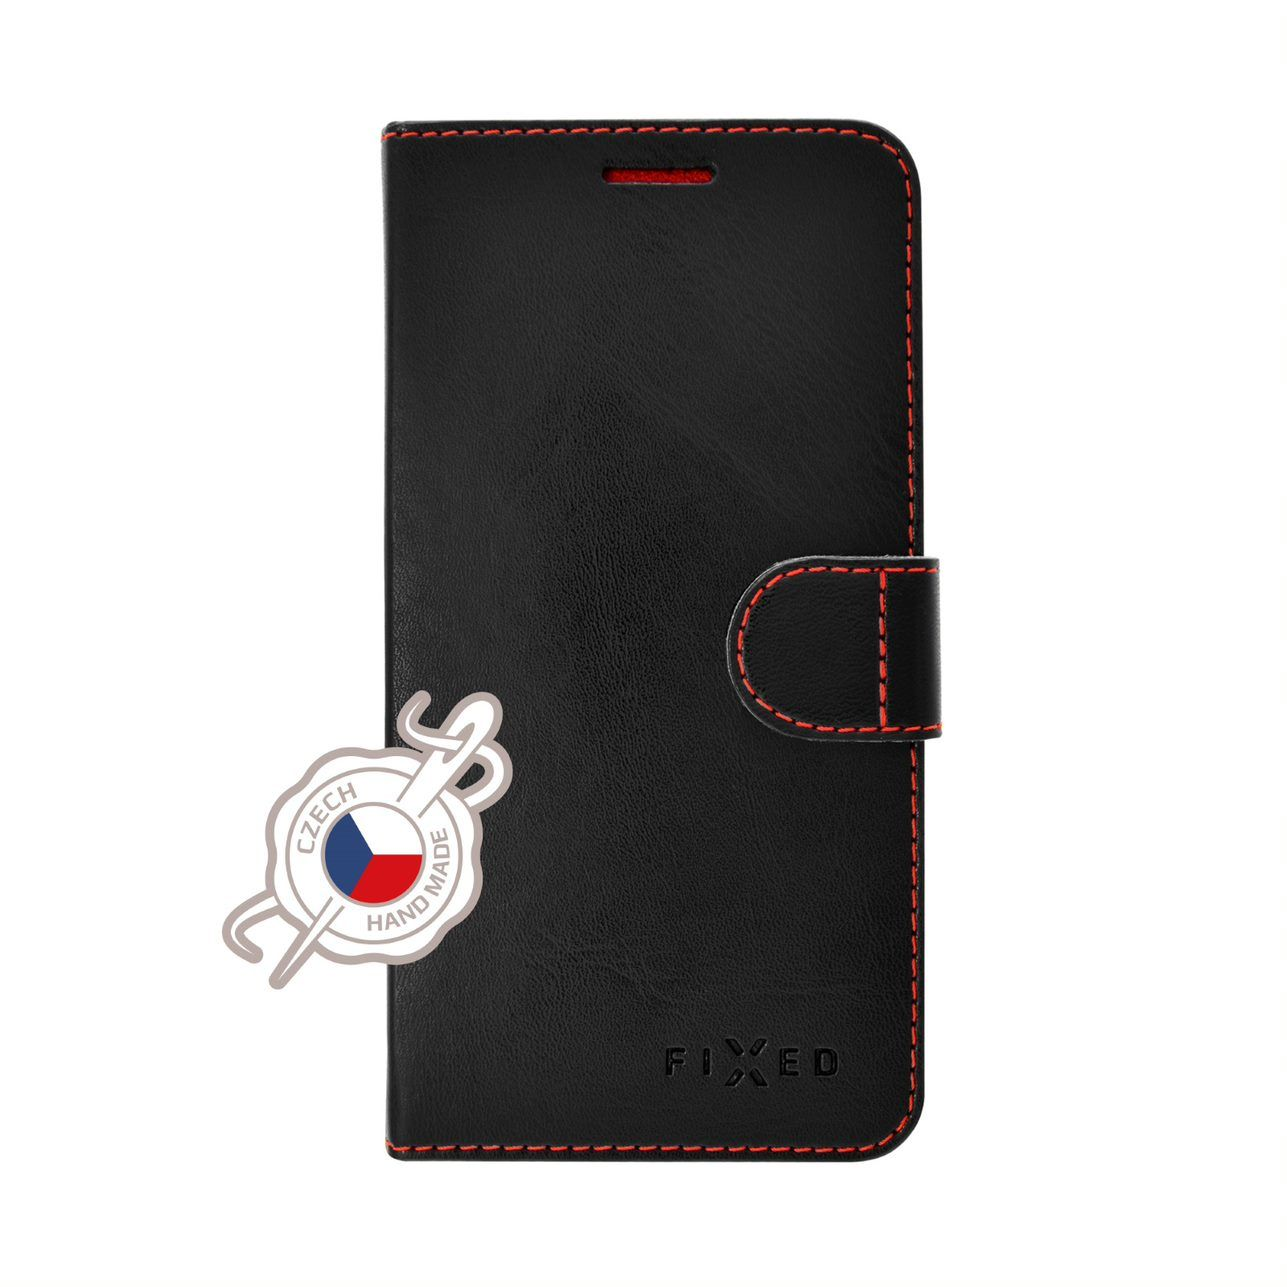 Pouzdro typu kniha FIXED FIT pro Samsung Galaxy J3 (2016), černé